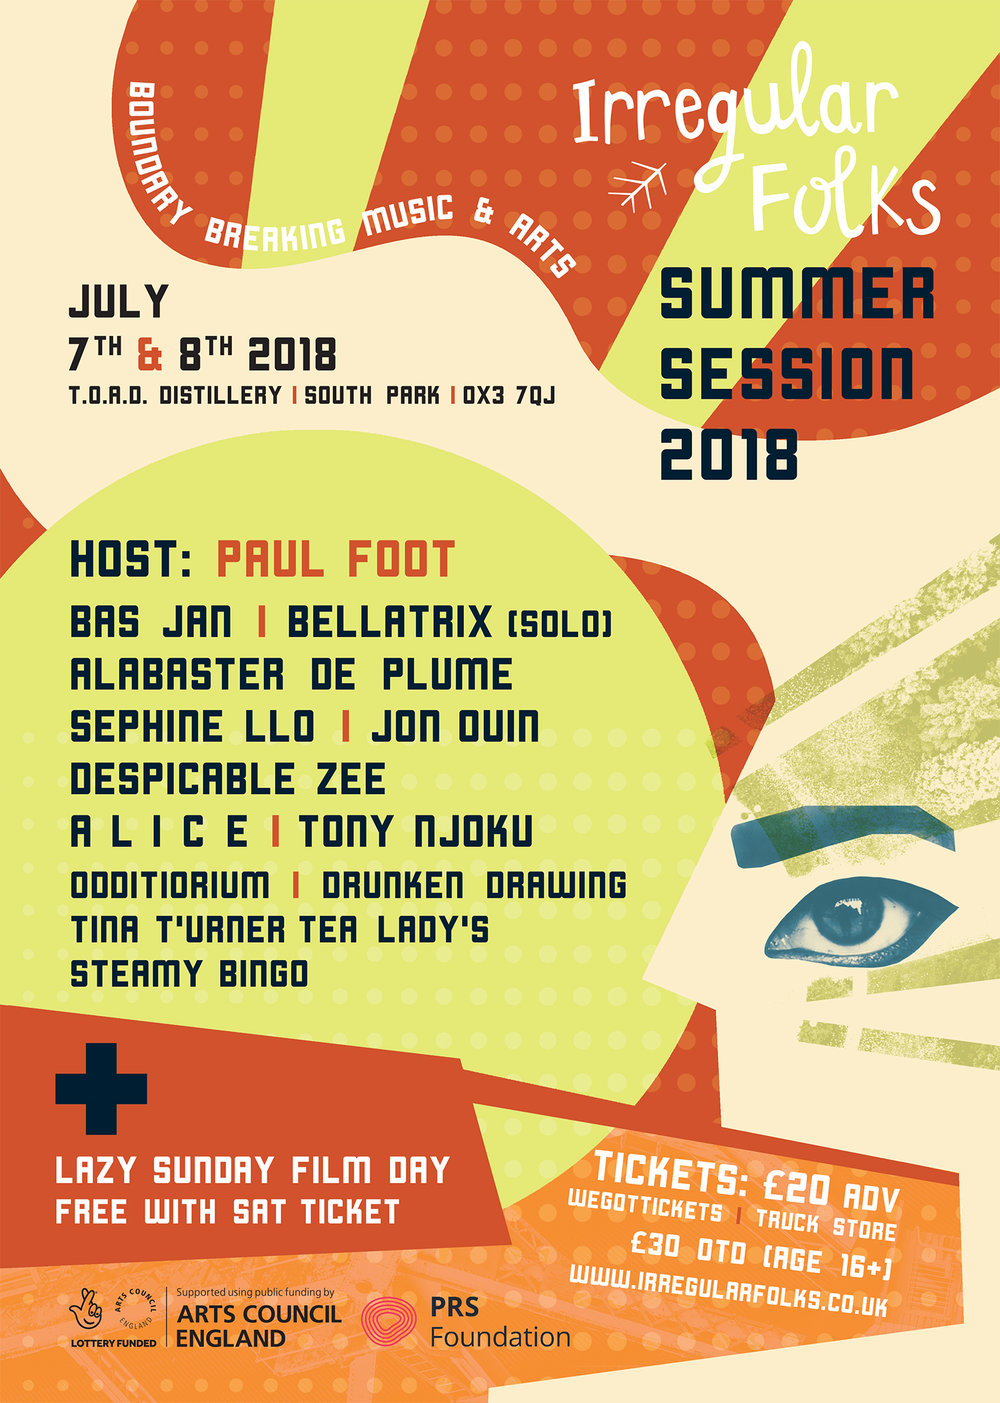 IFSS18_Summer 2018_Poster-Orange.jpg